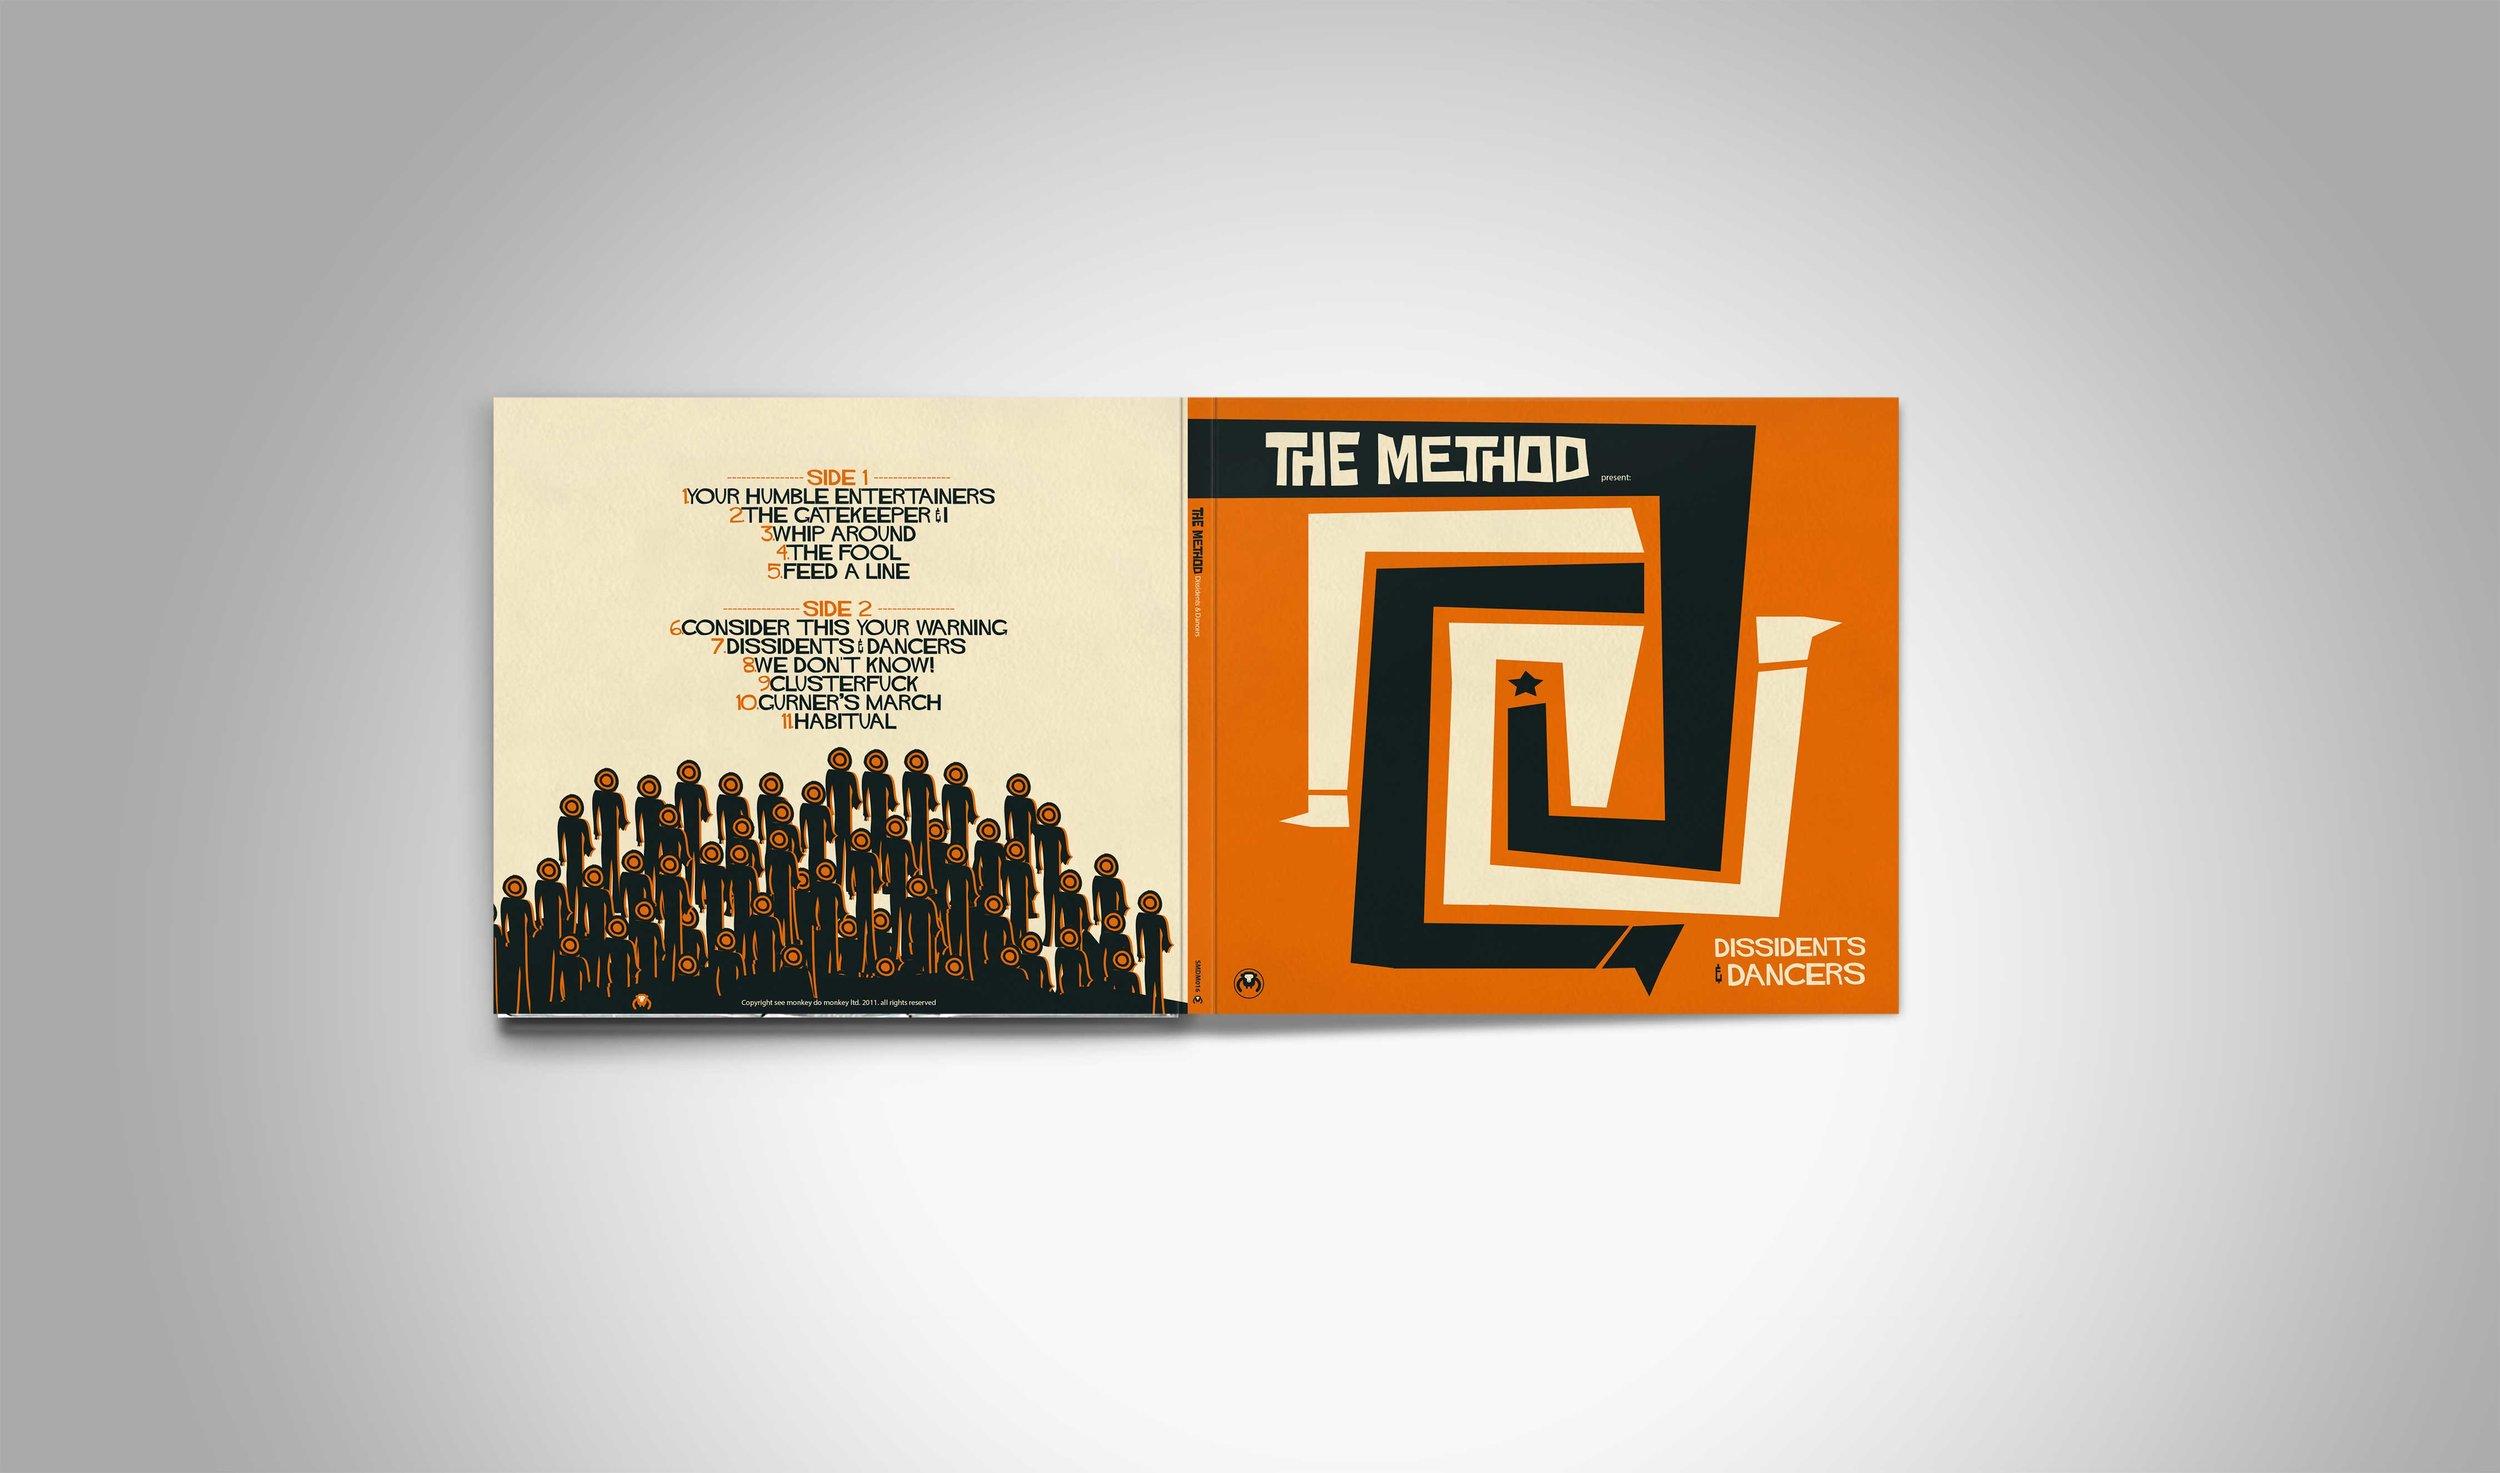 Method-Cover-Digipack-Mockup-Premium-Kit.jpg